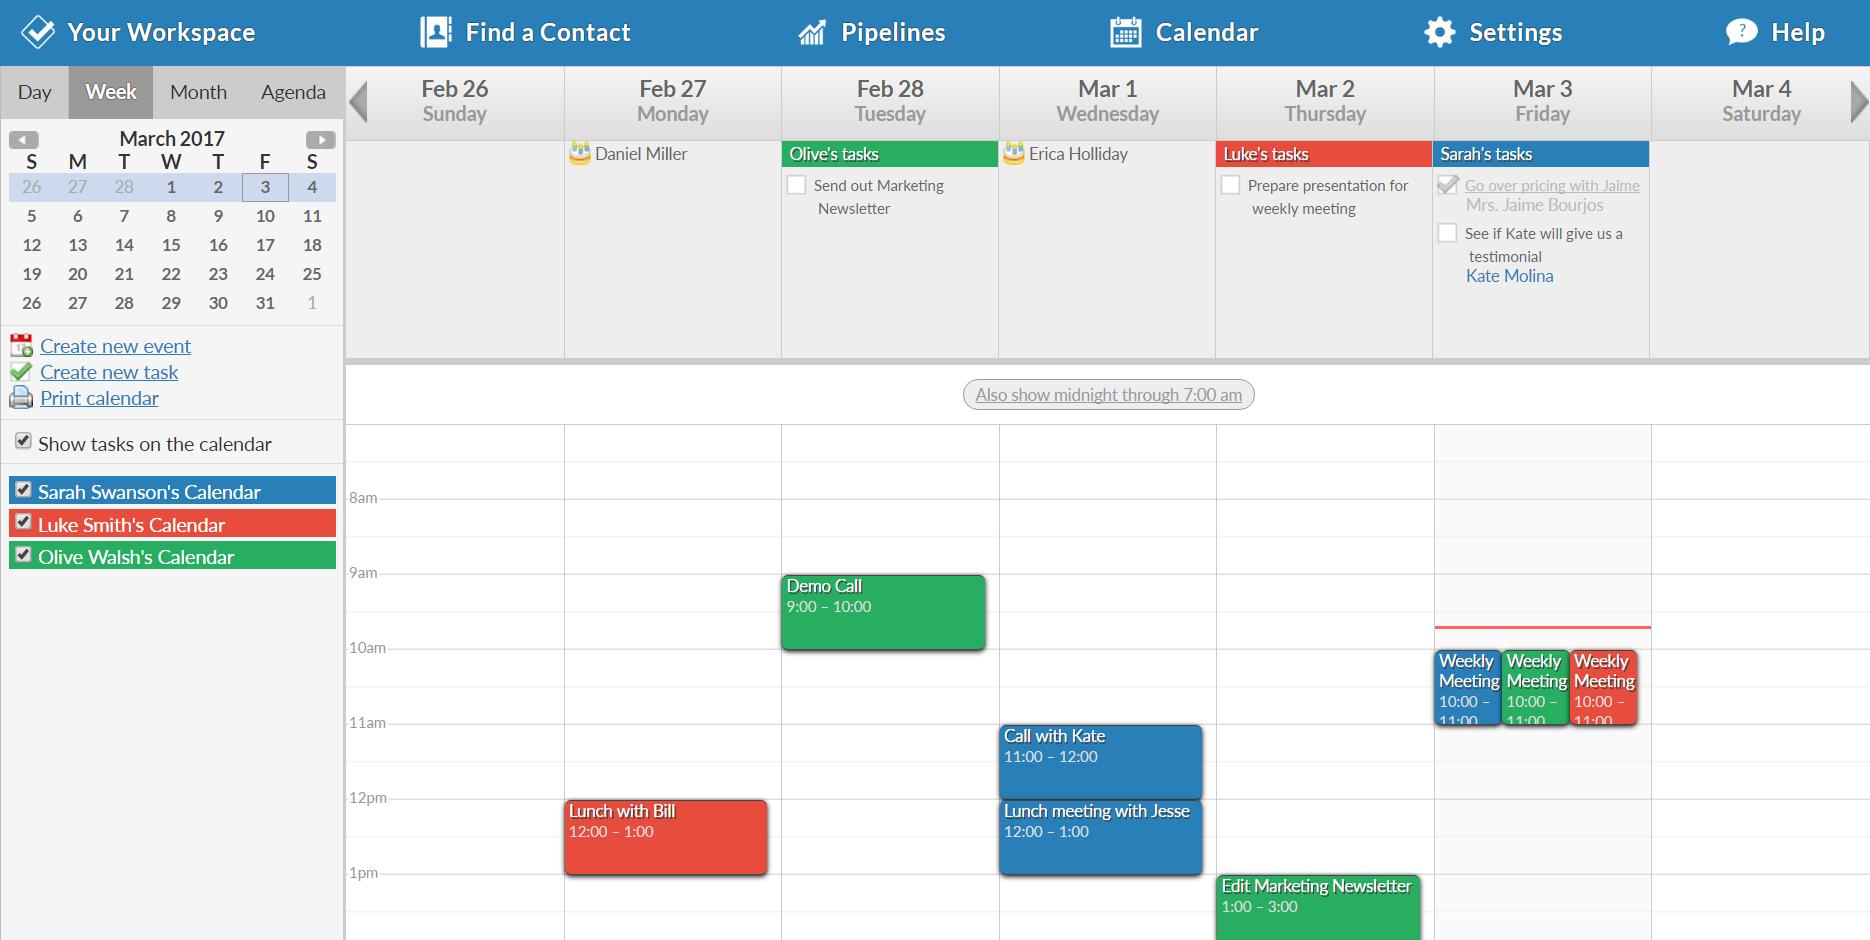 Less Annoying CRM Software - Less Annoying CRM Calendar